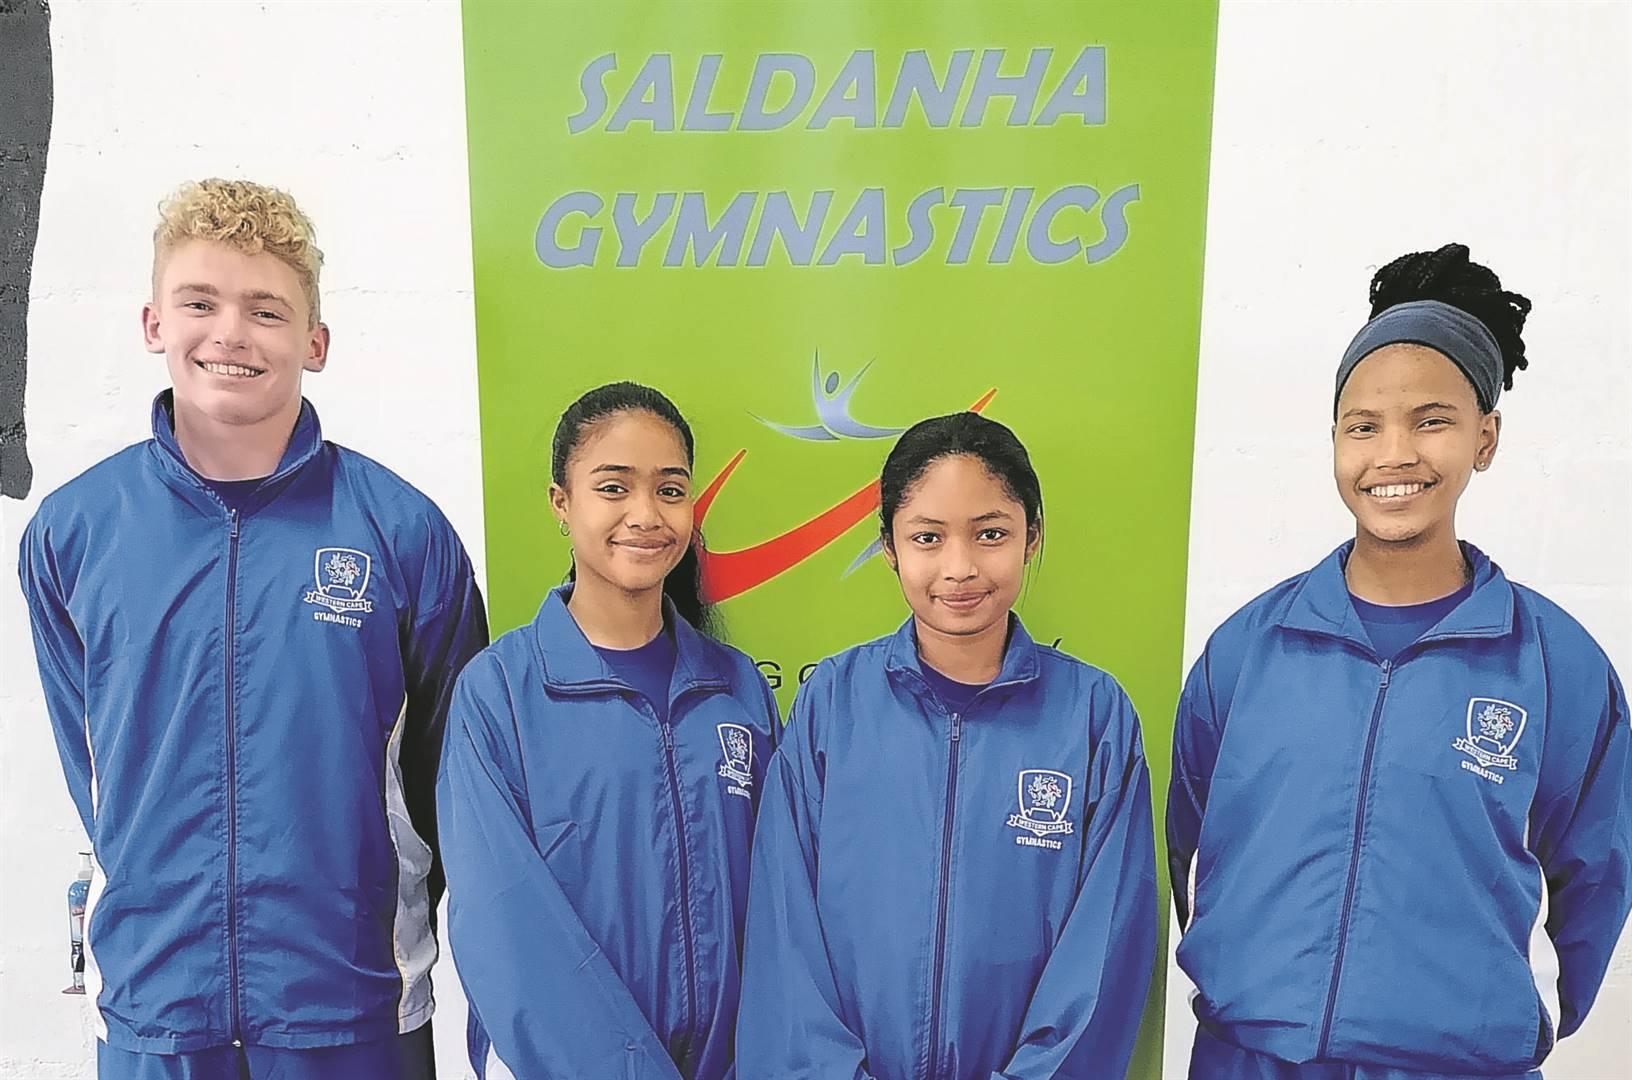 Gymnasts Jannich Bezuidenhout, Tashnique Jones, Kaylin Agulhas and Amy Van Rooyen.Foto: